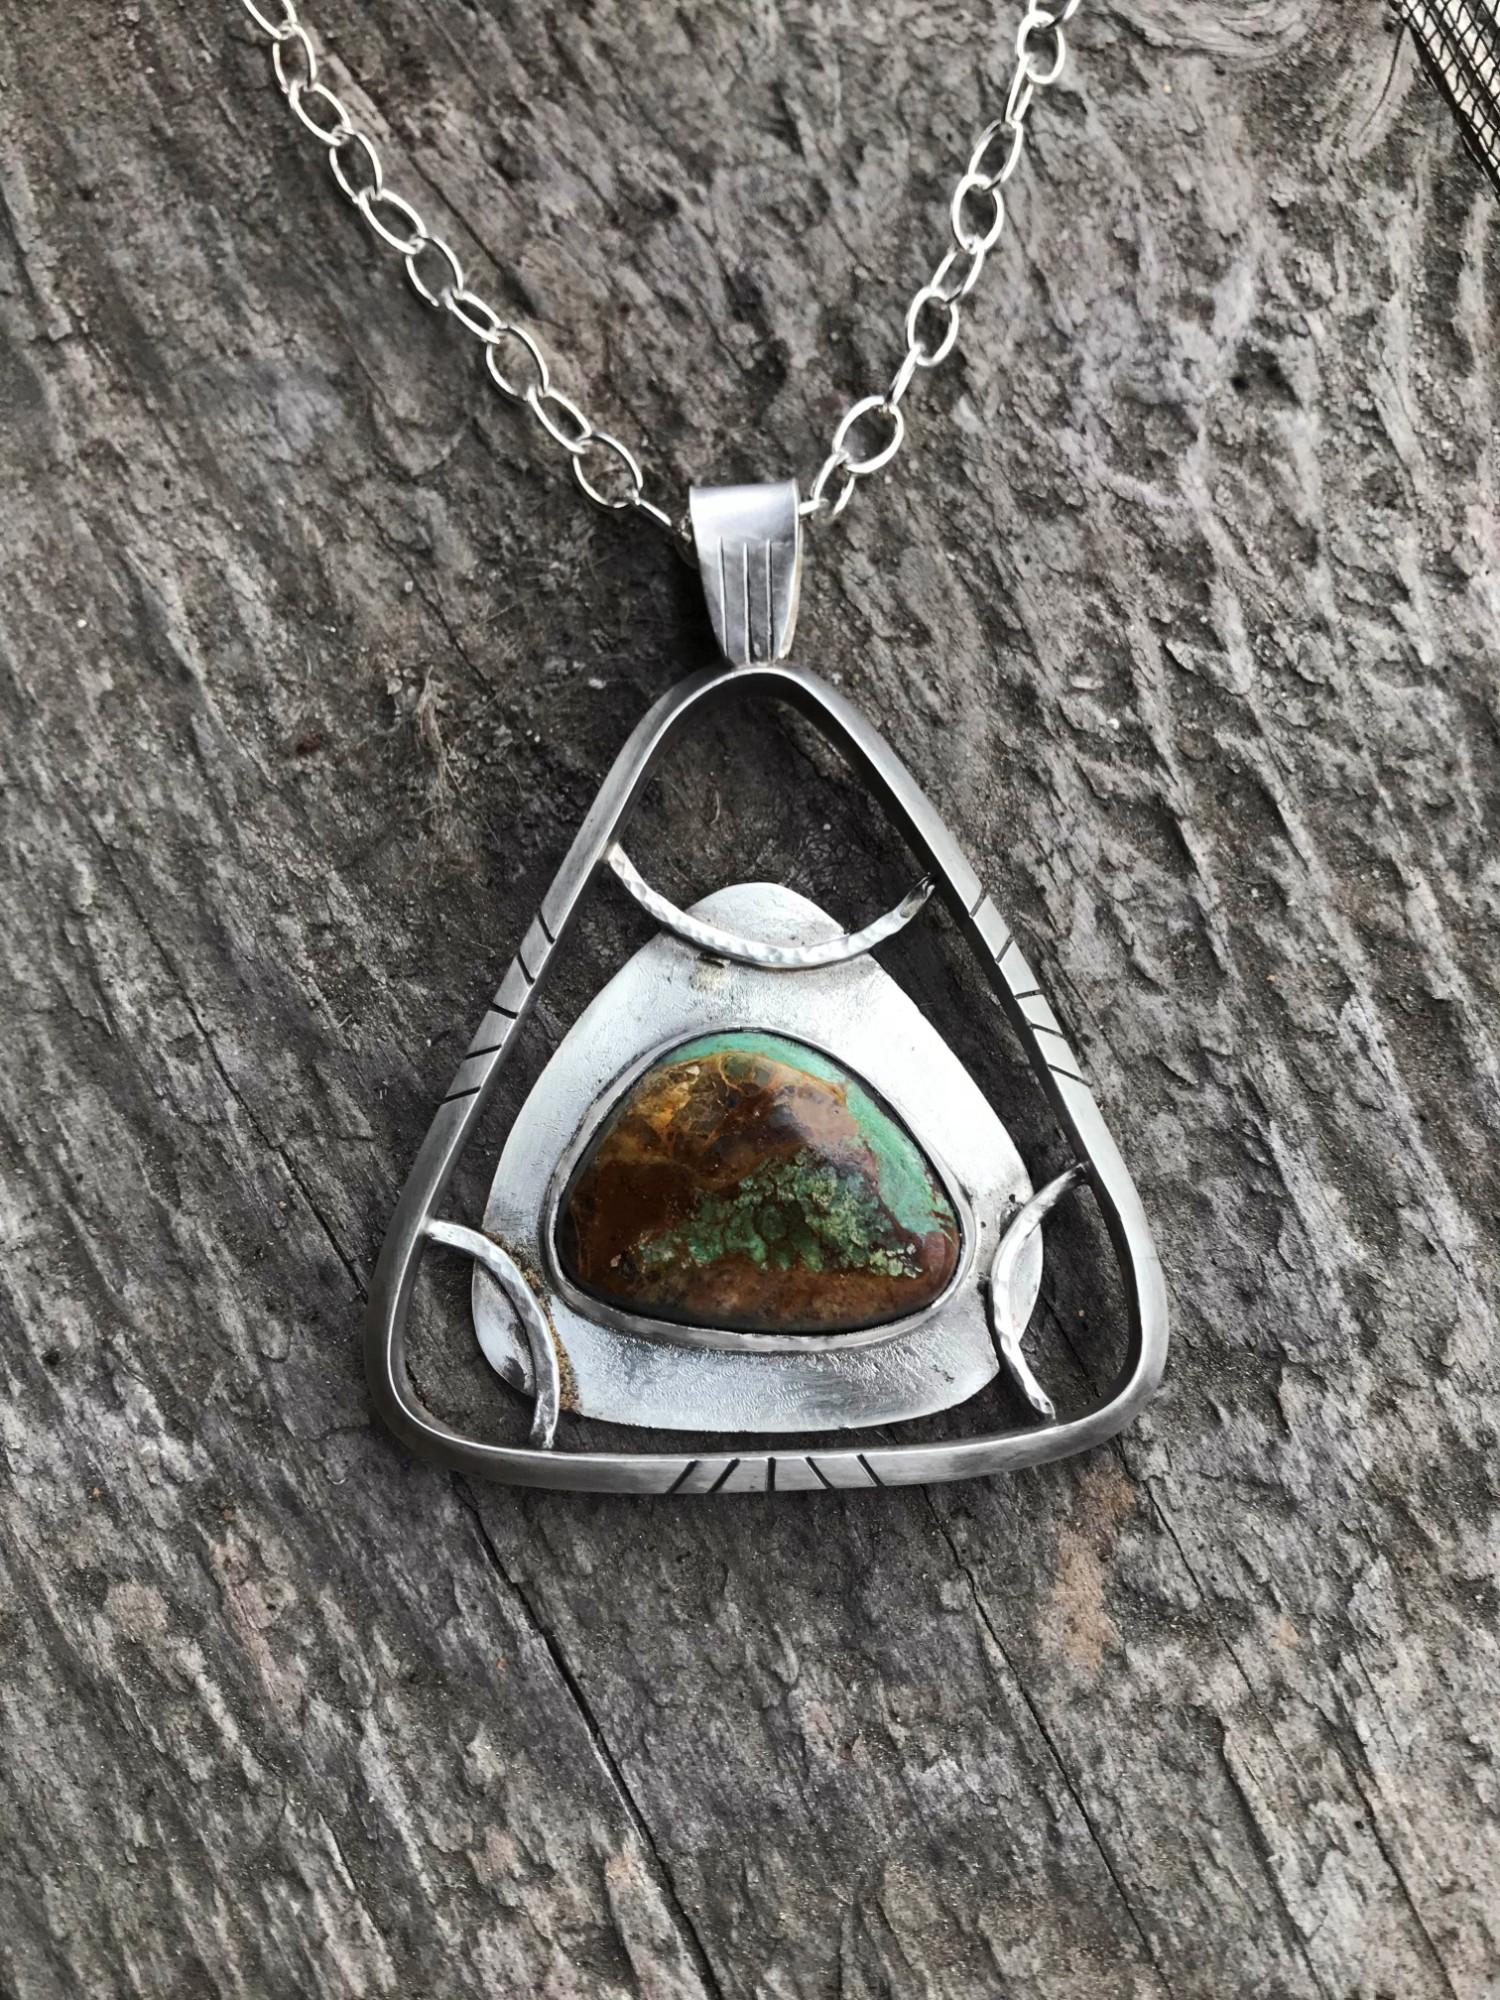 monte-rhodes-natural-gemstone-jewelry-turquoise.jpg